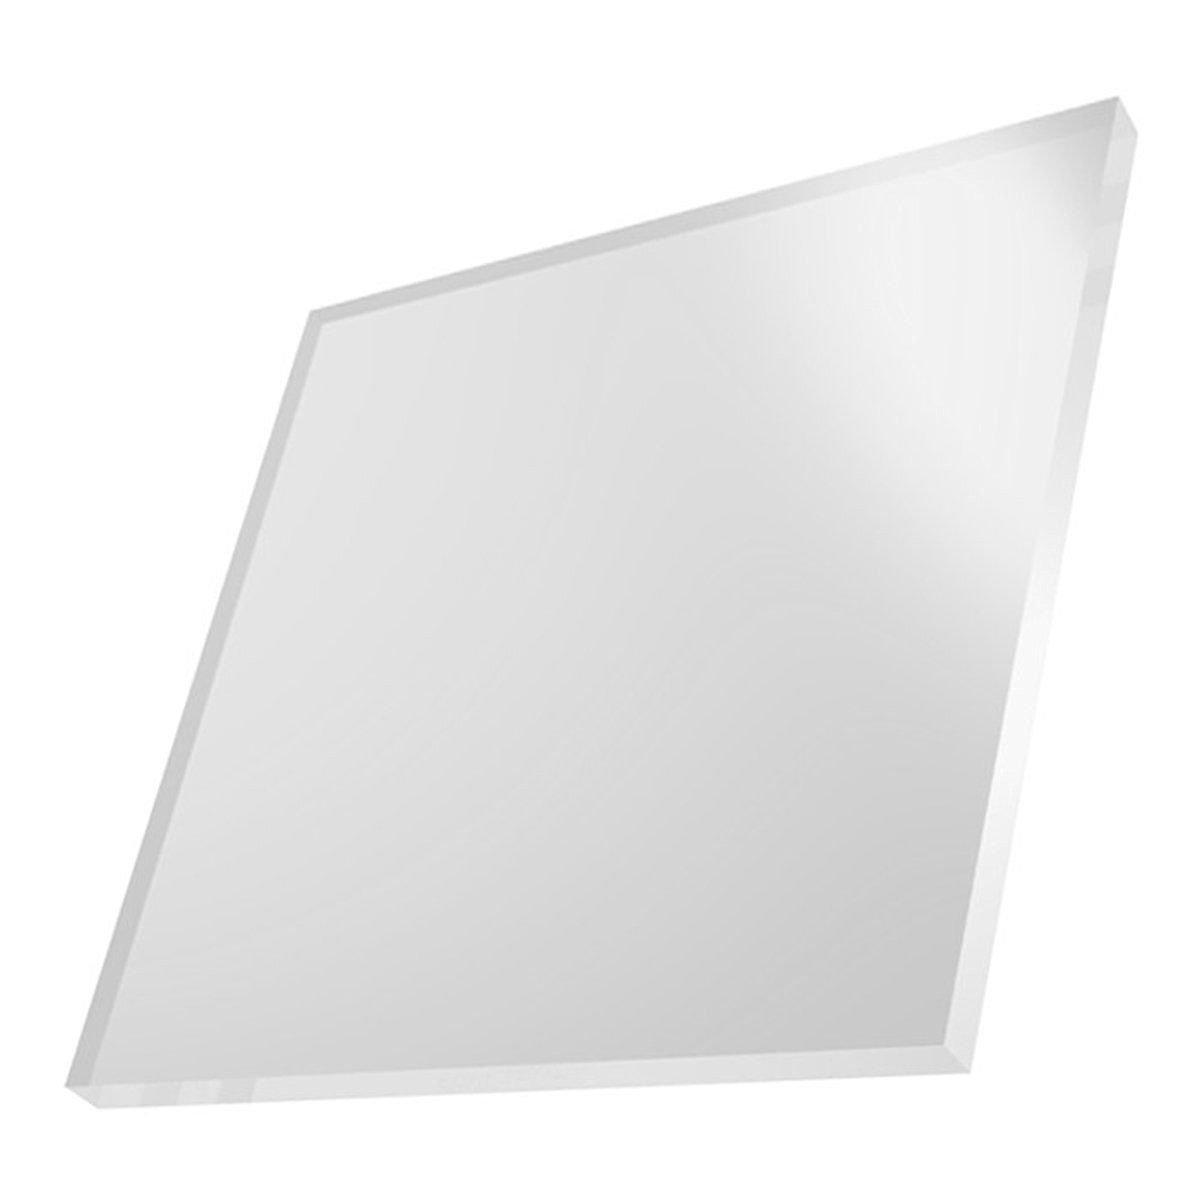 PLEXIGLASS ACRYLIC SHEET USED IN CRAFT NAMEPLATE GLAZING RISER 24X48 3MM WHITE